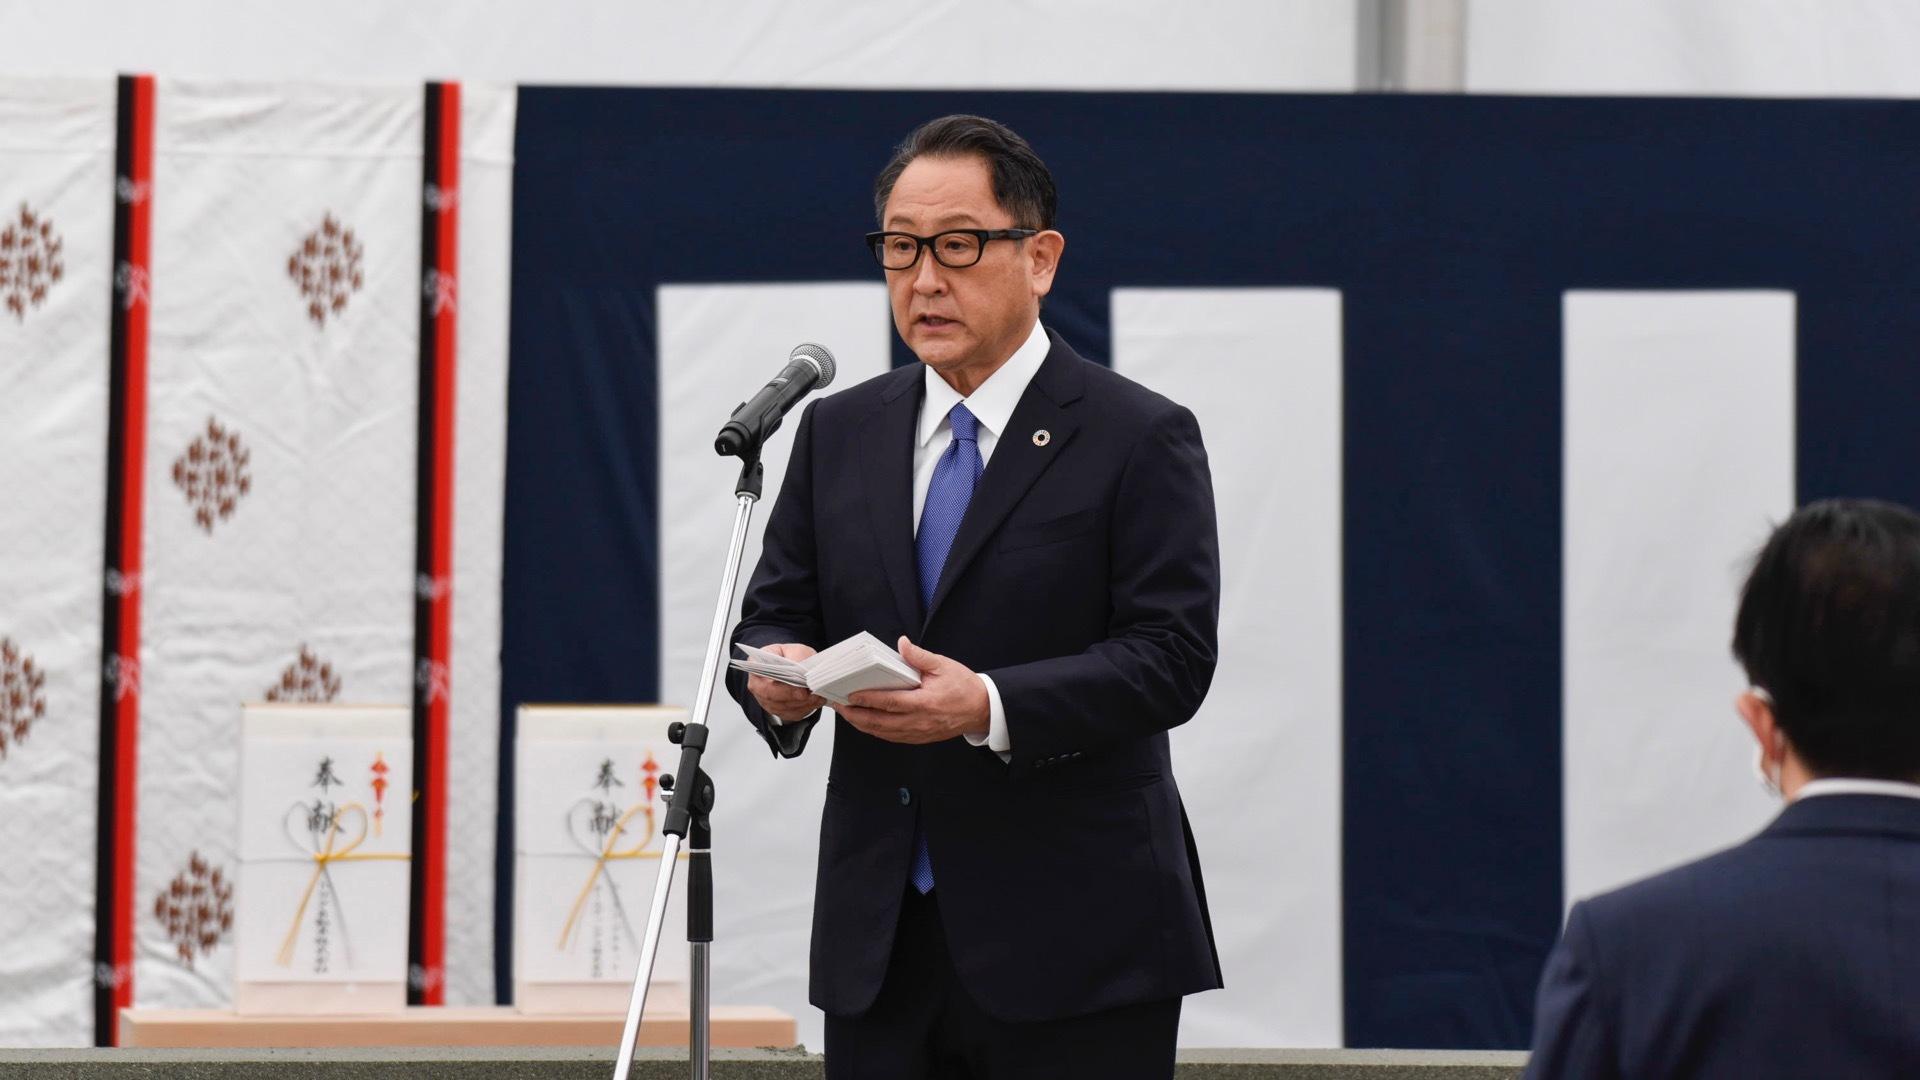 Toyota CEO Akio Toyoda at Woven City groundbreaking